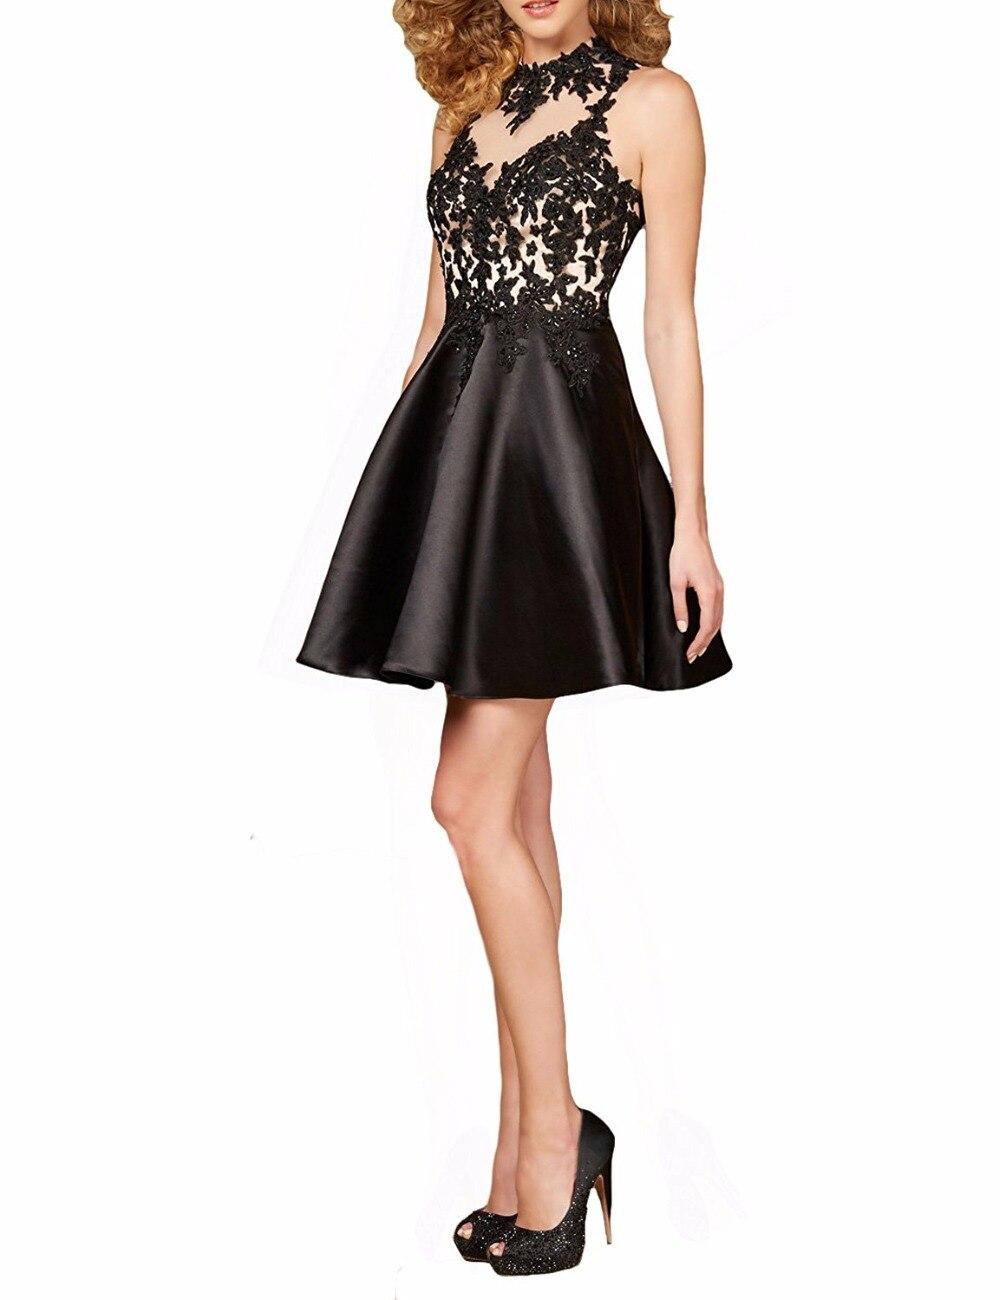 Black dress juniors - Customise Lace Short Black Prom Dresses Sheer Vestido De Festa A Line Junior Party Dresses